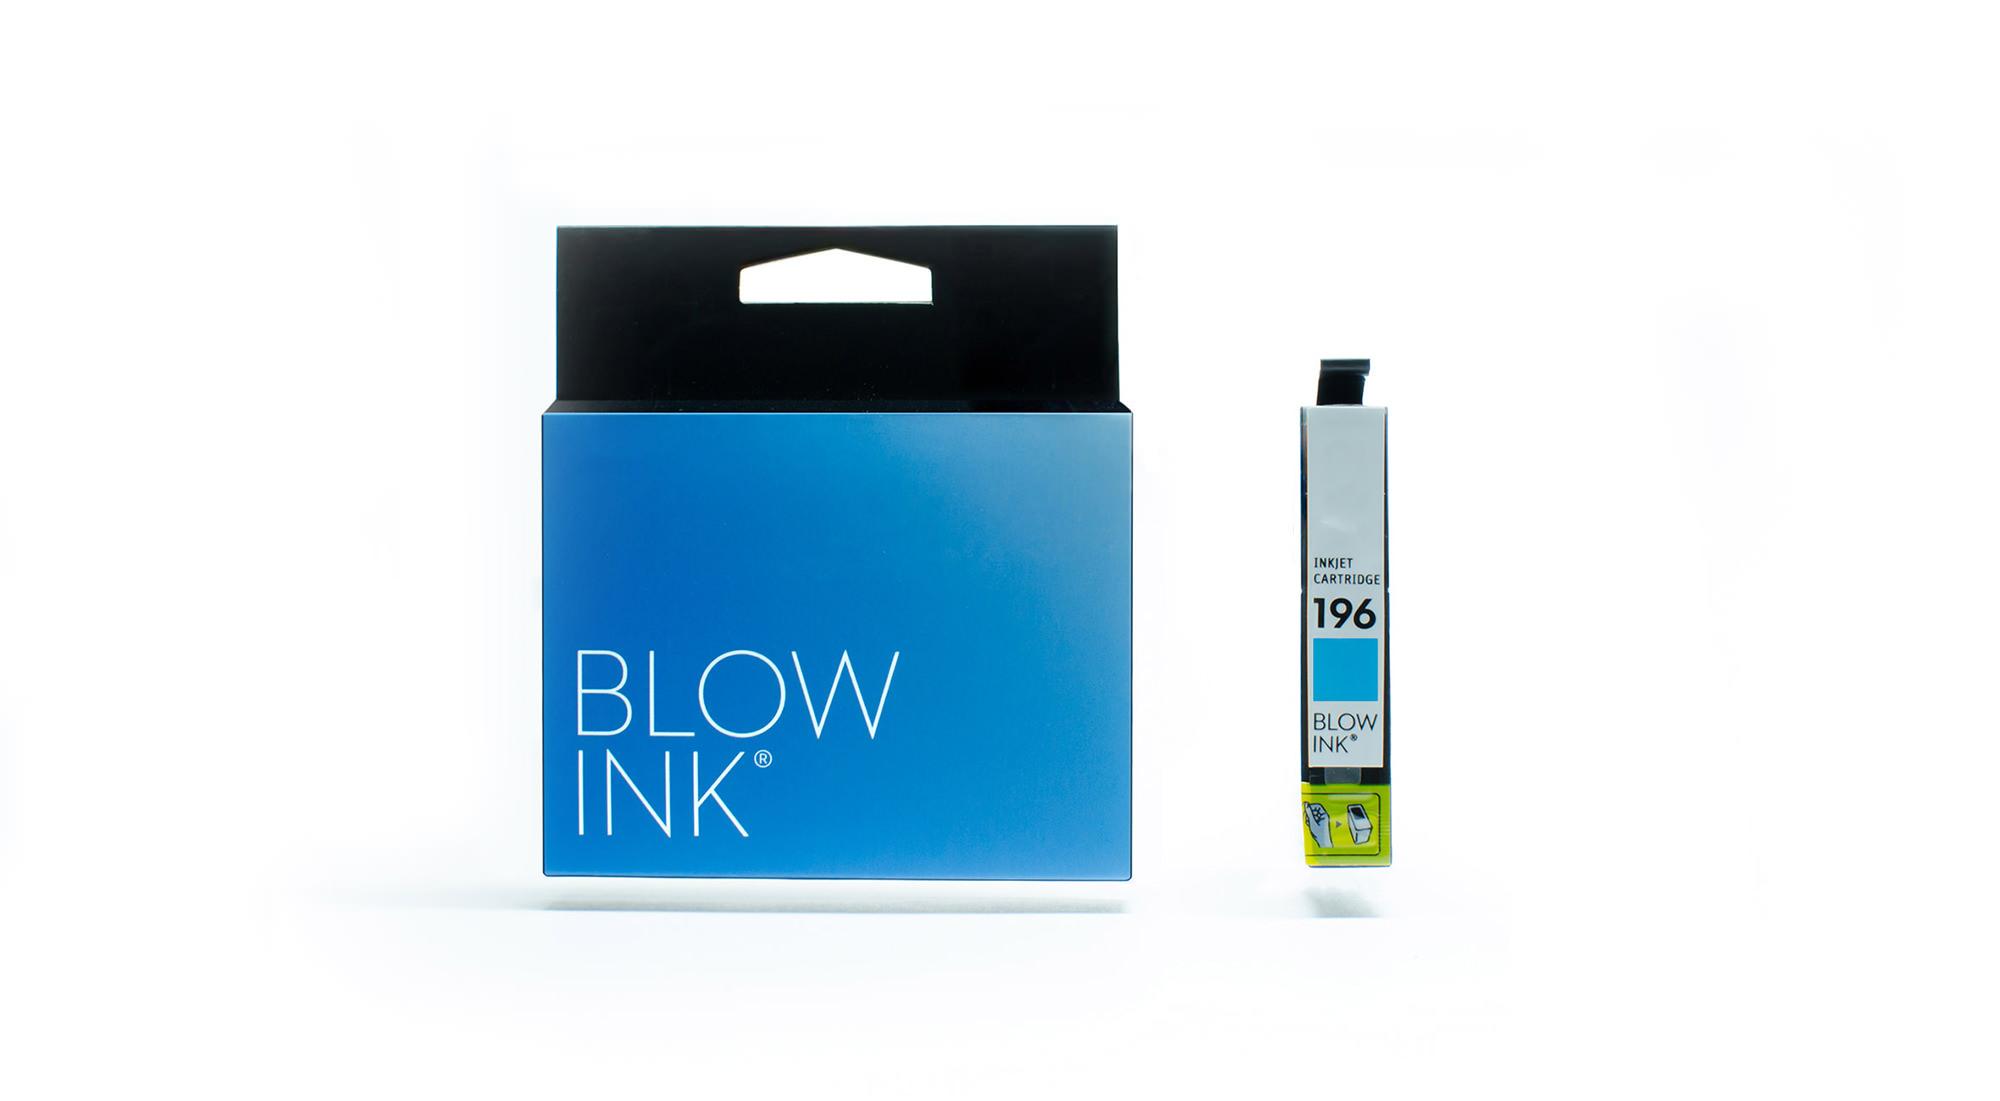 Blow Ink